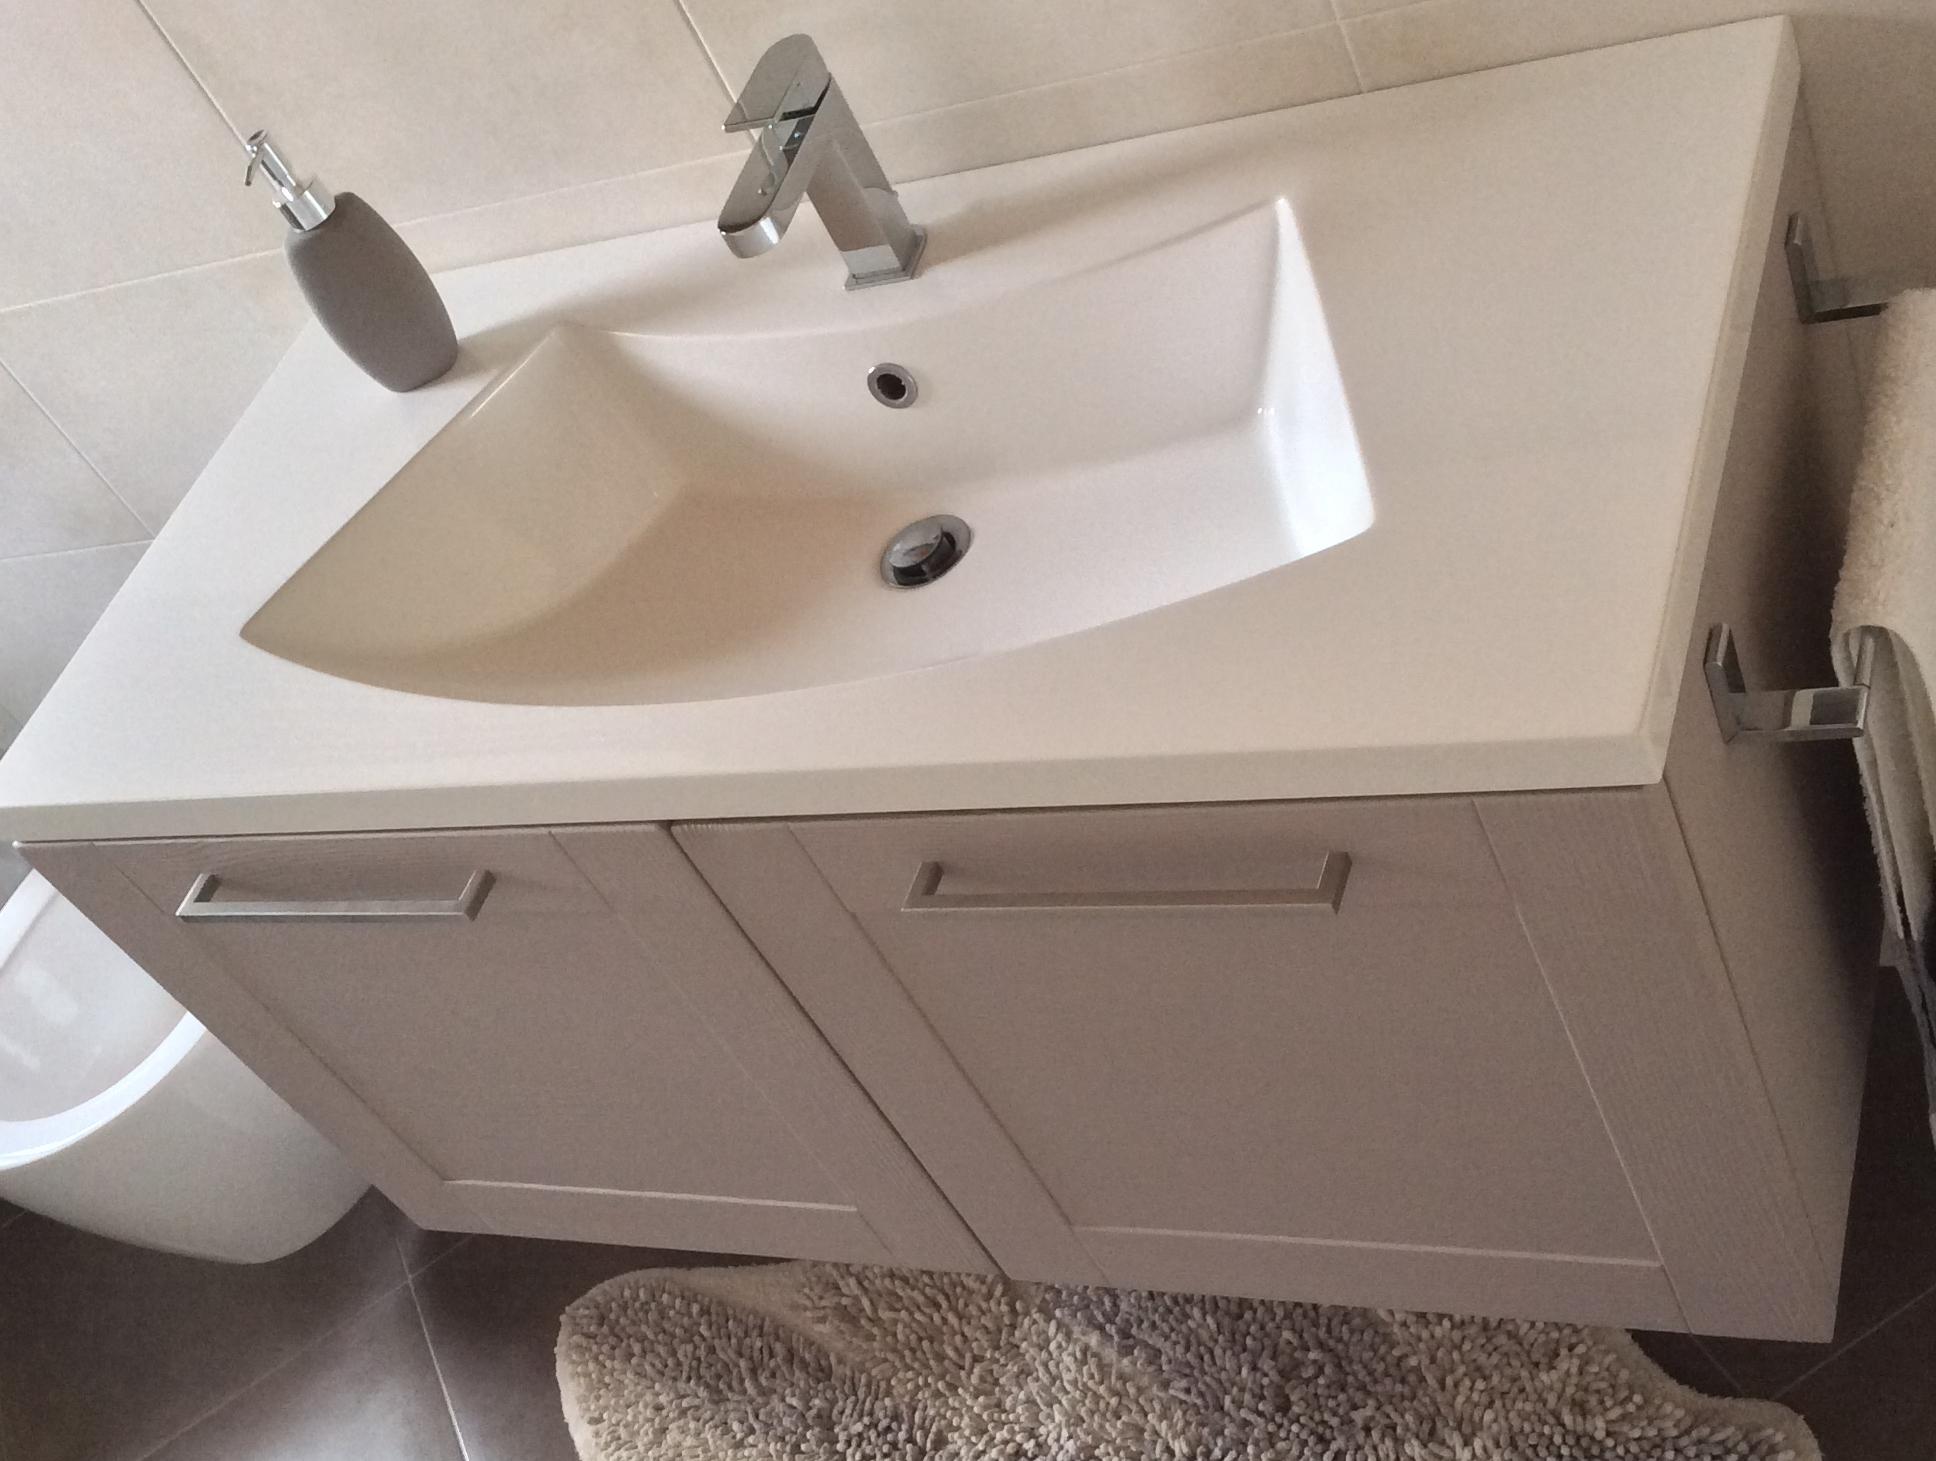 arredo bagno moderno e mobili da bagno contemporanei. mobile bagno ...